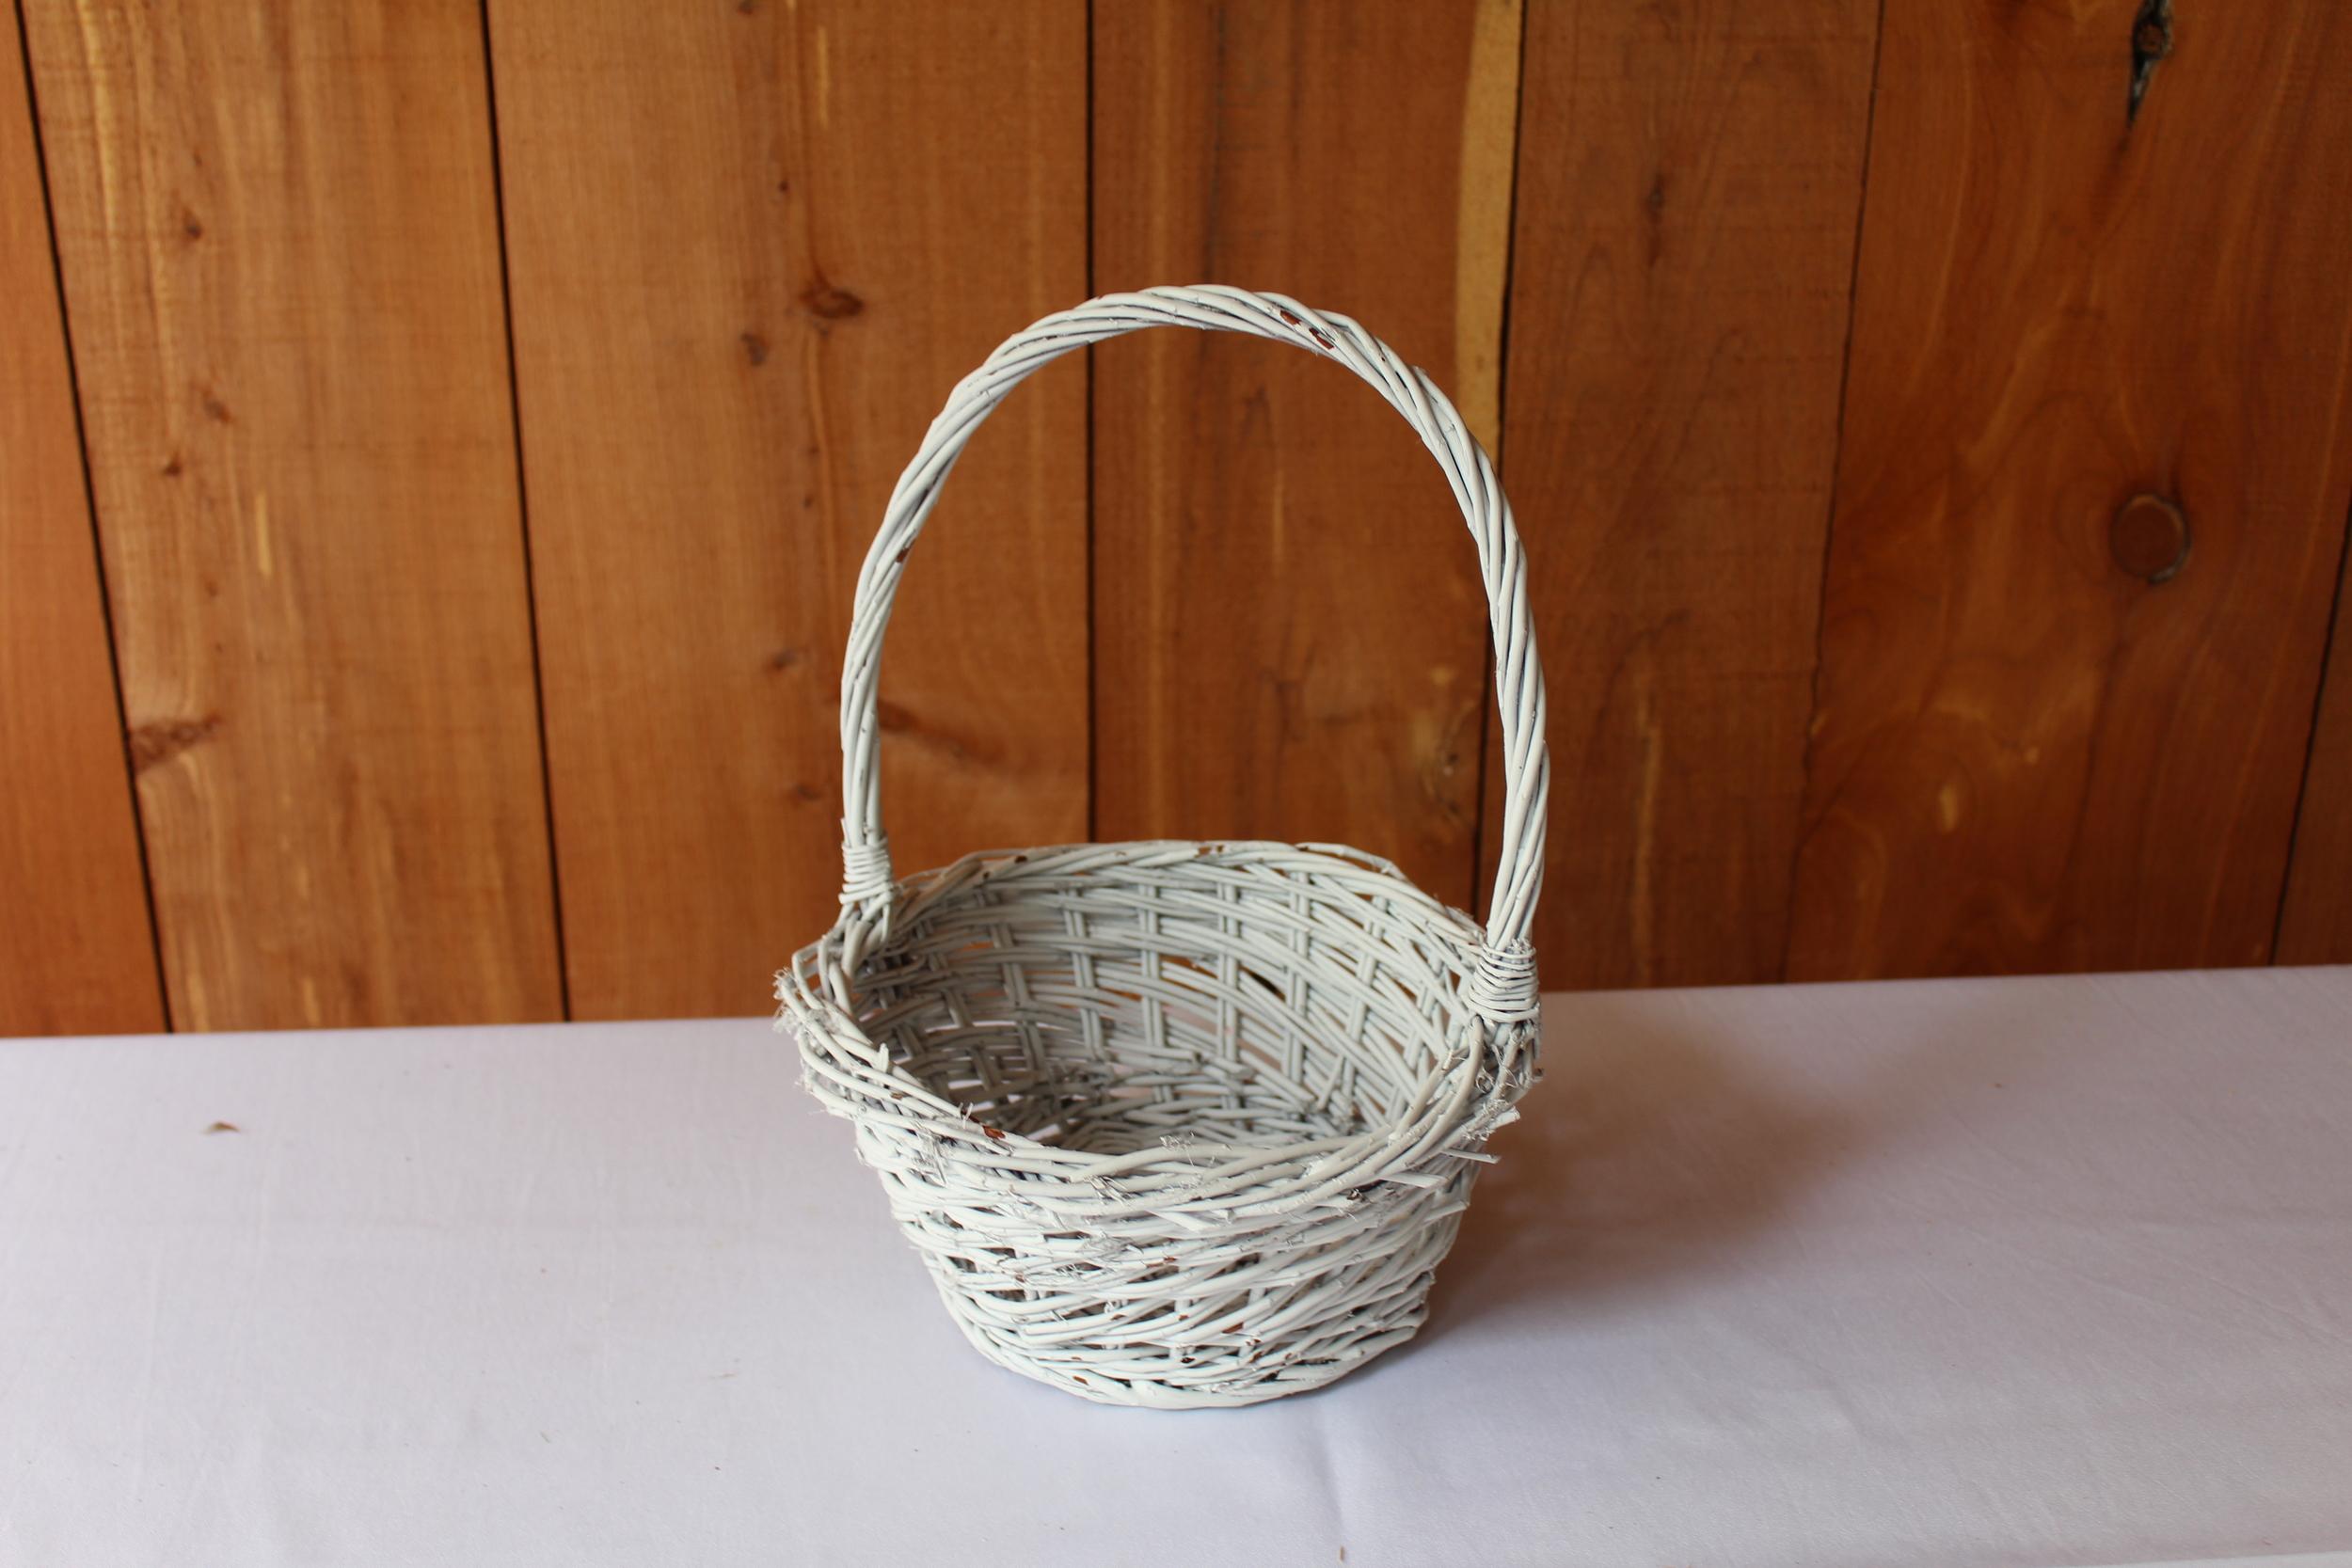 #82 - White Wicker Basket